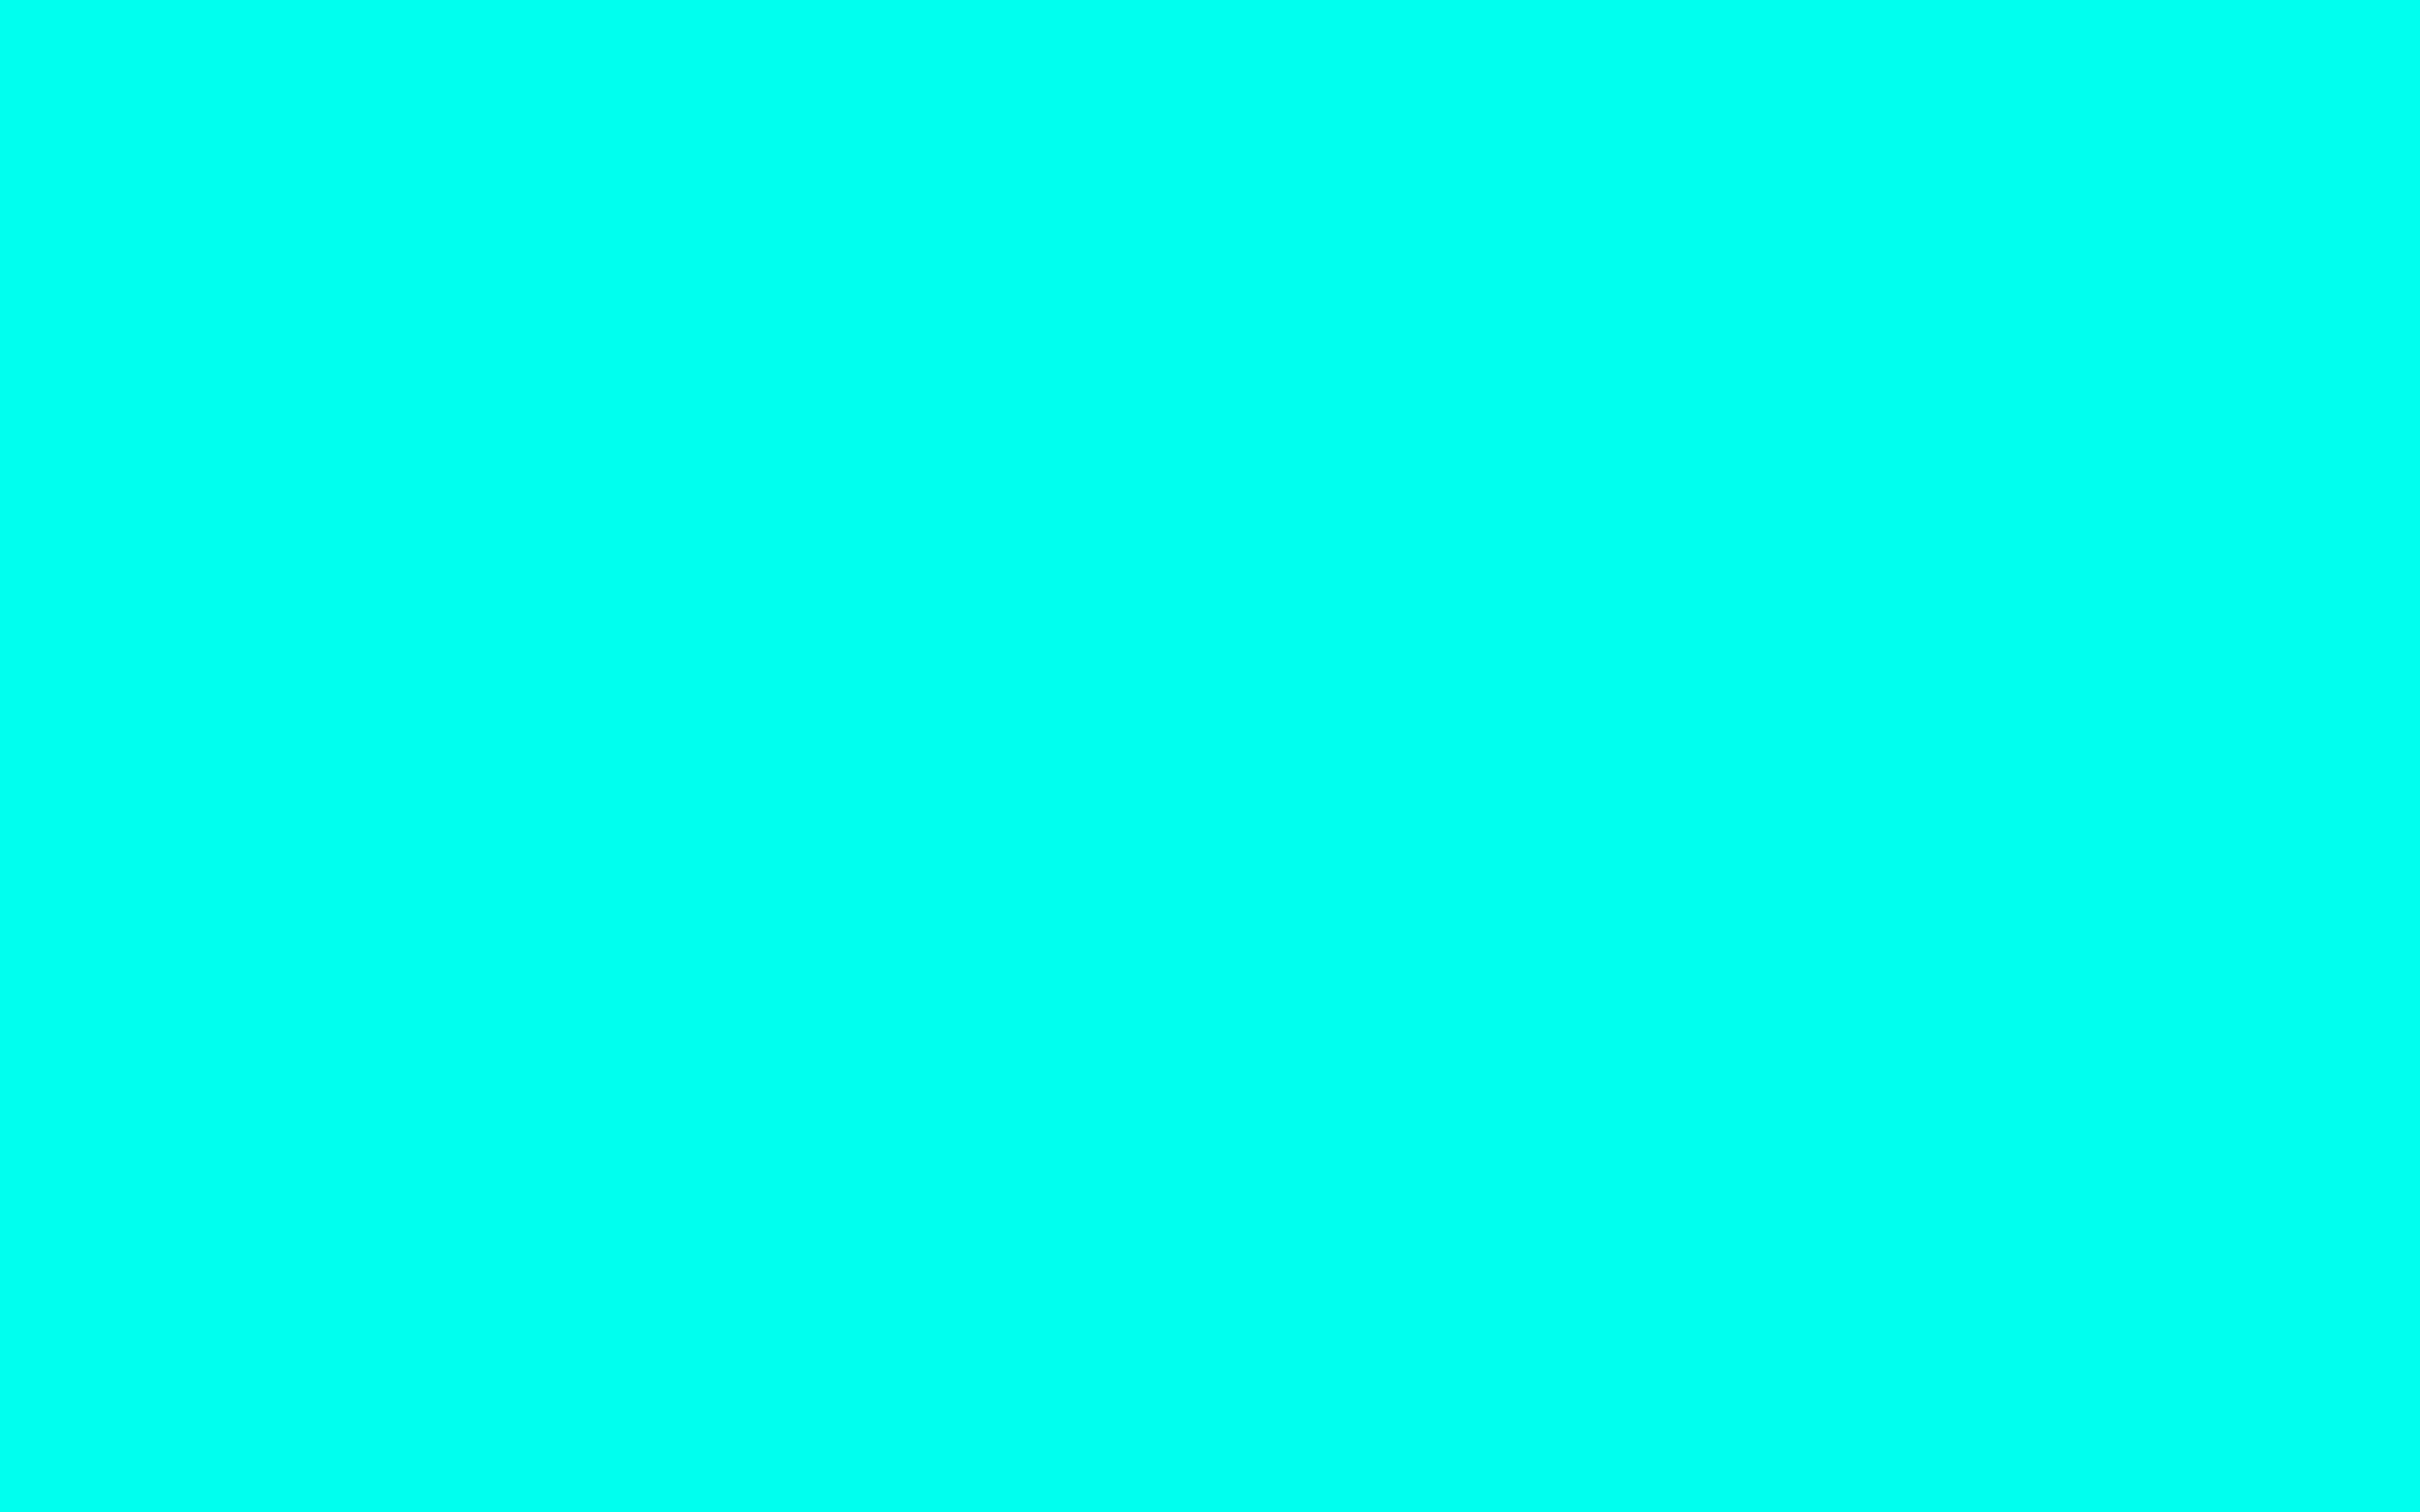 Turquoise Paint B Q